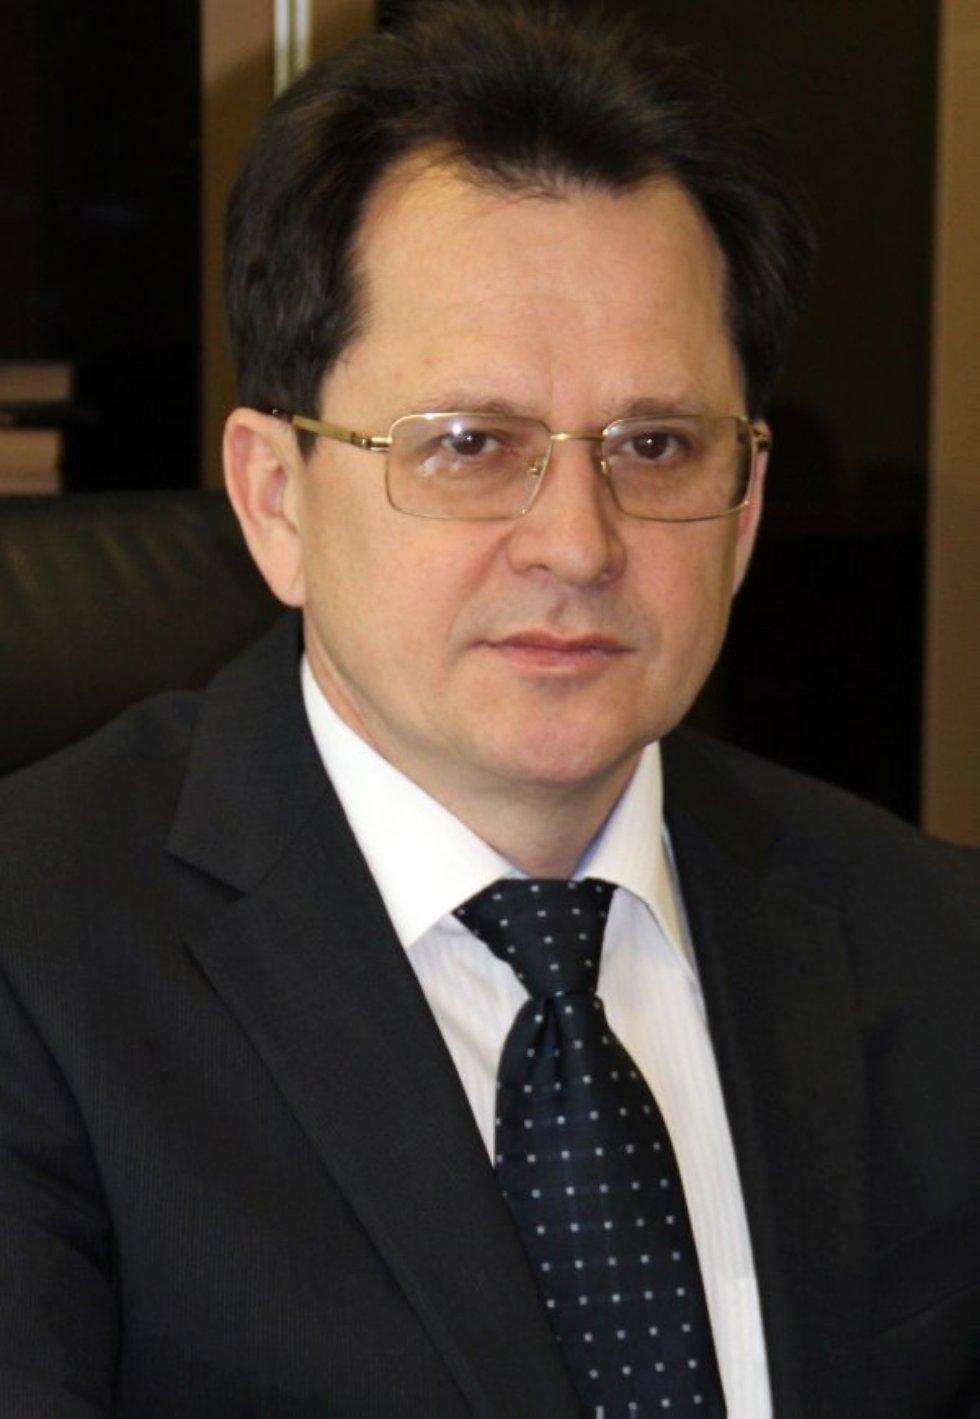 Ганиев Махмут Масхутович